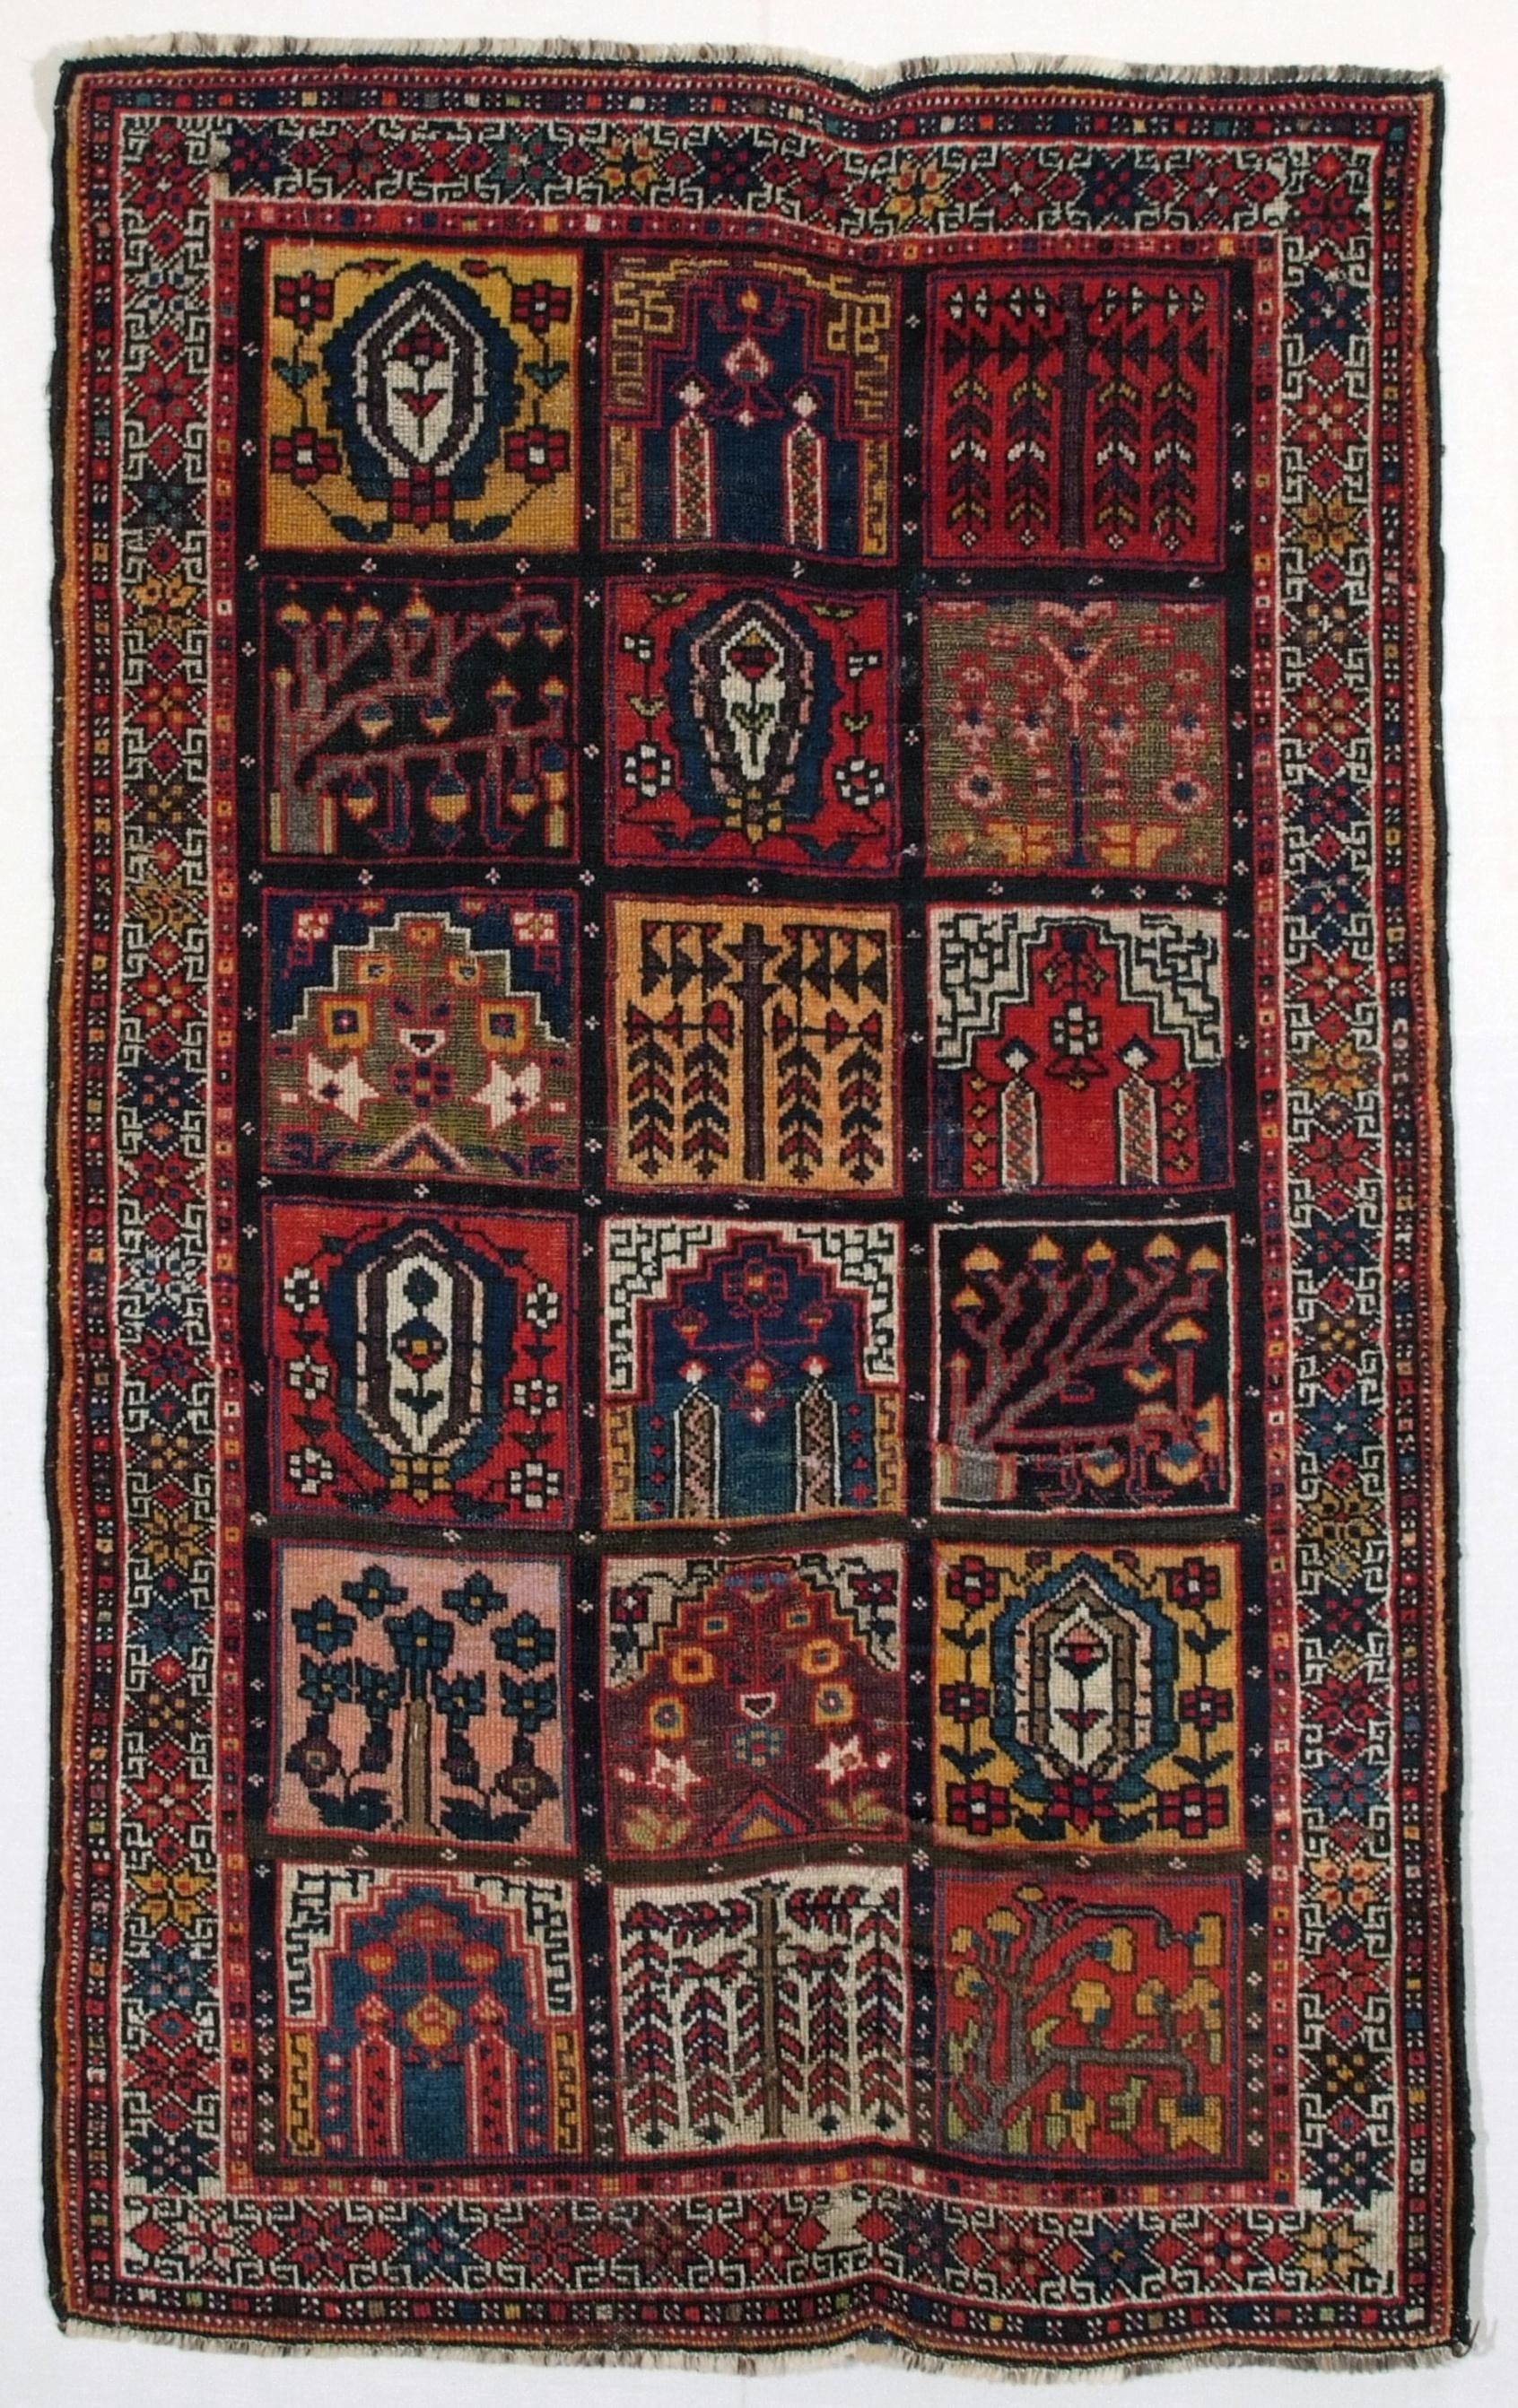 Bakhtiari bibi baf persiano antico cm 200x120 tea tappeti - Tea tappeti roma ...